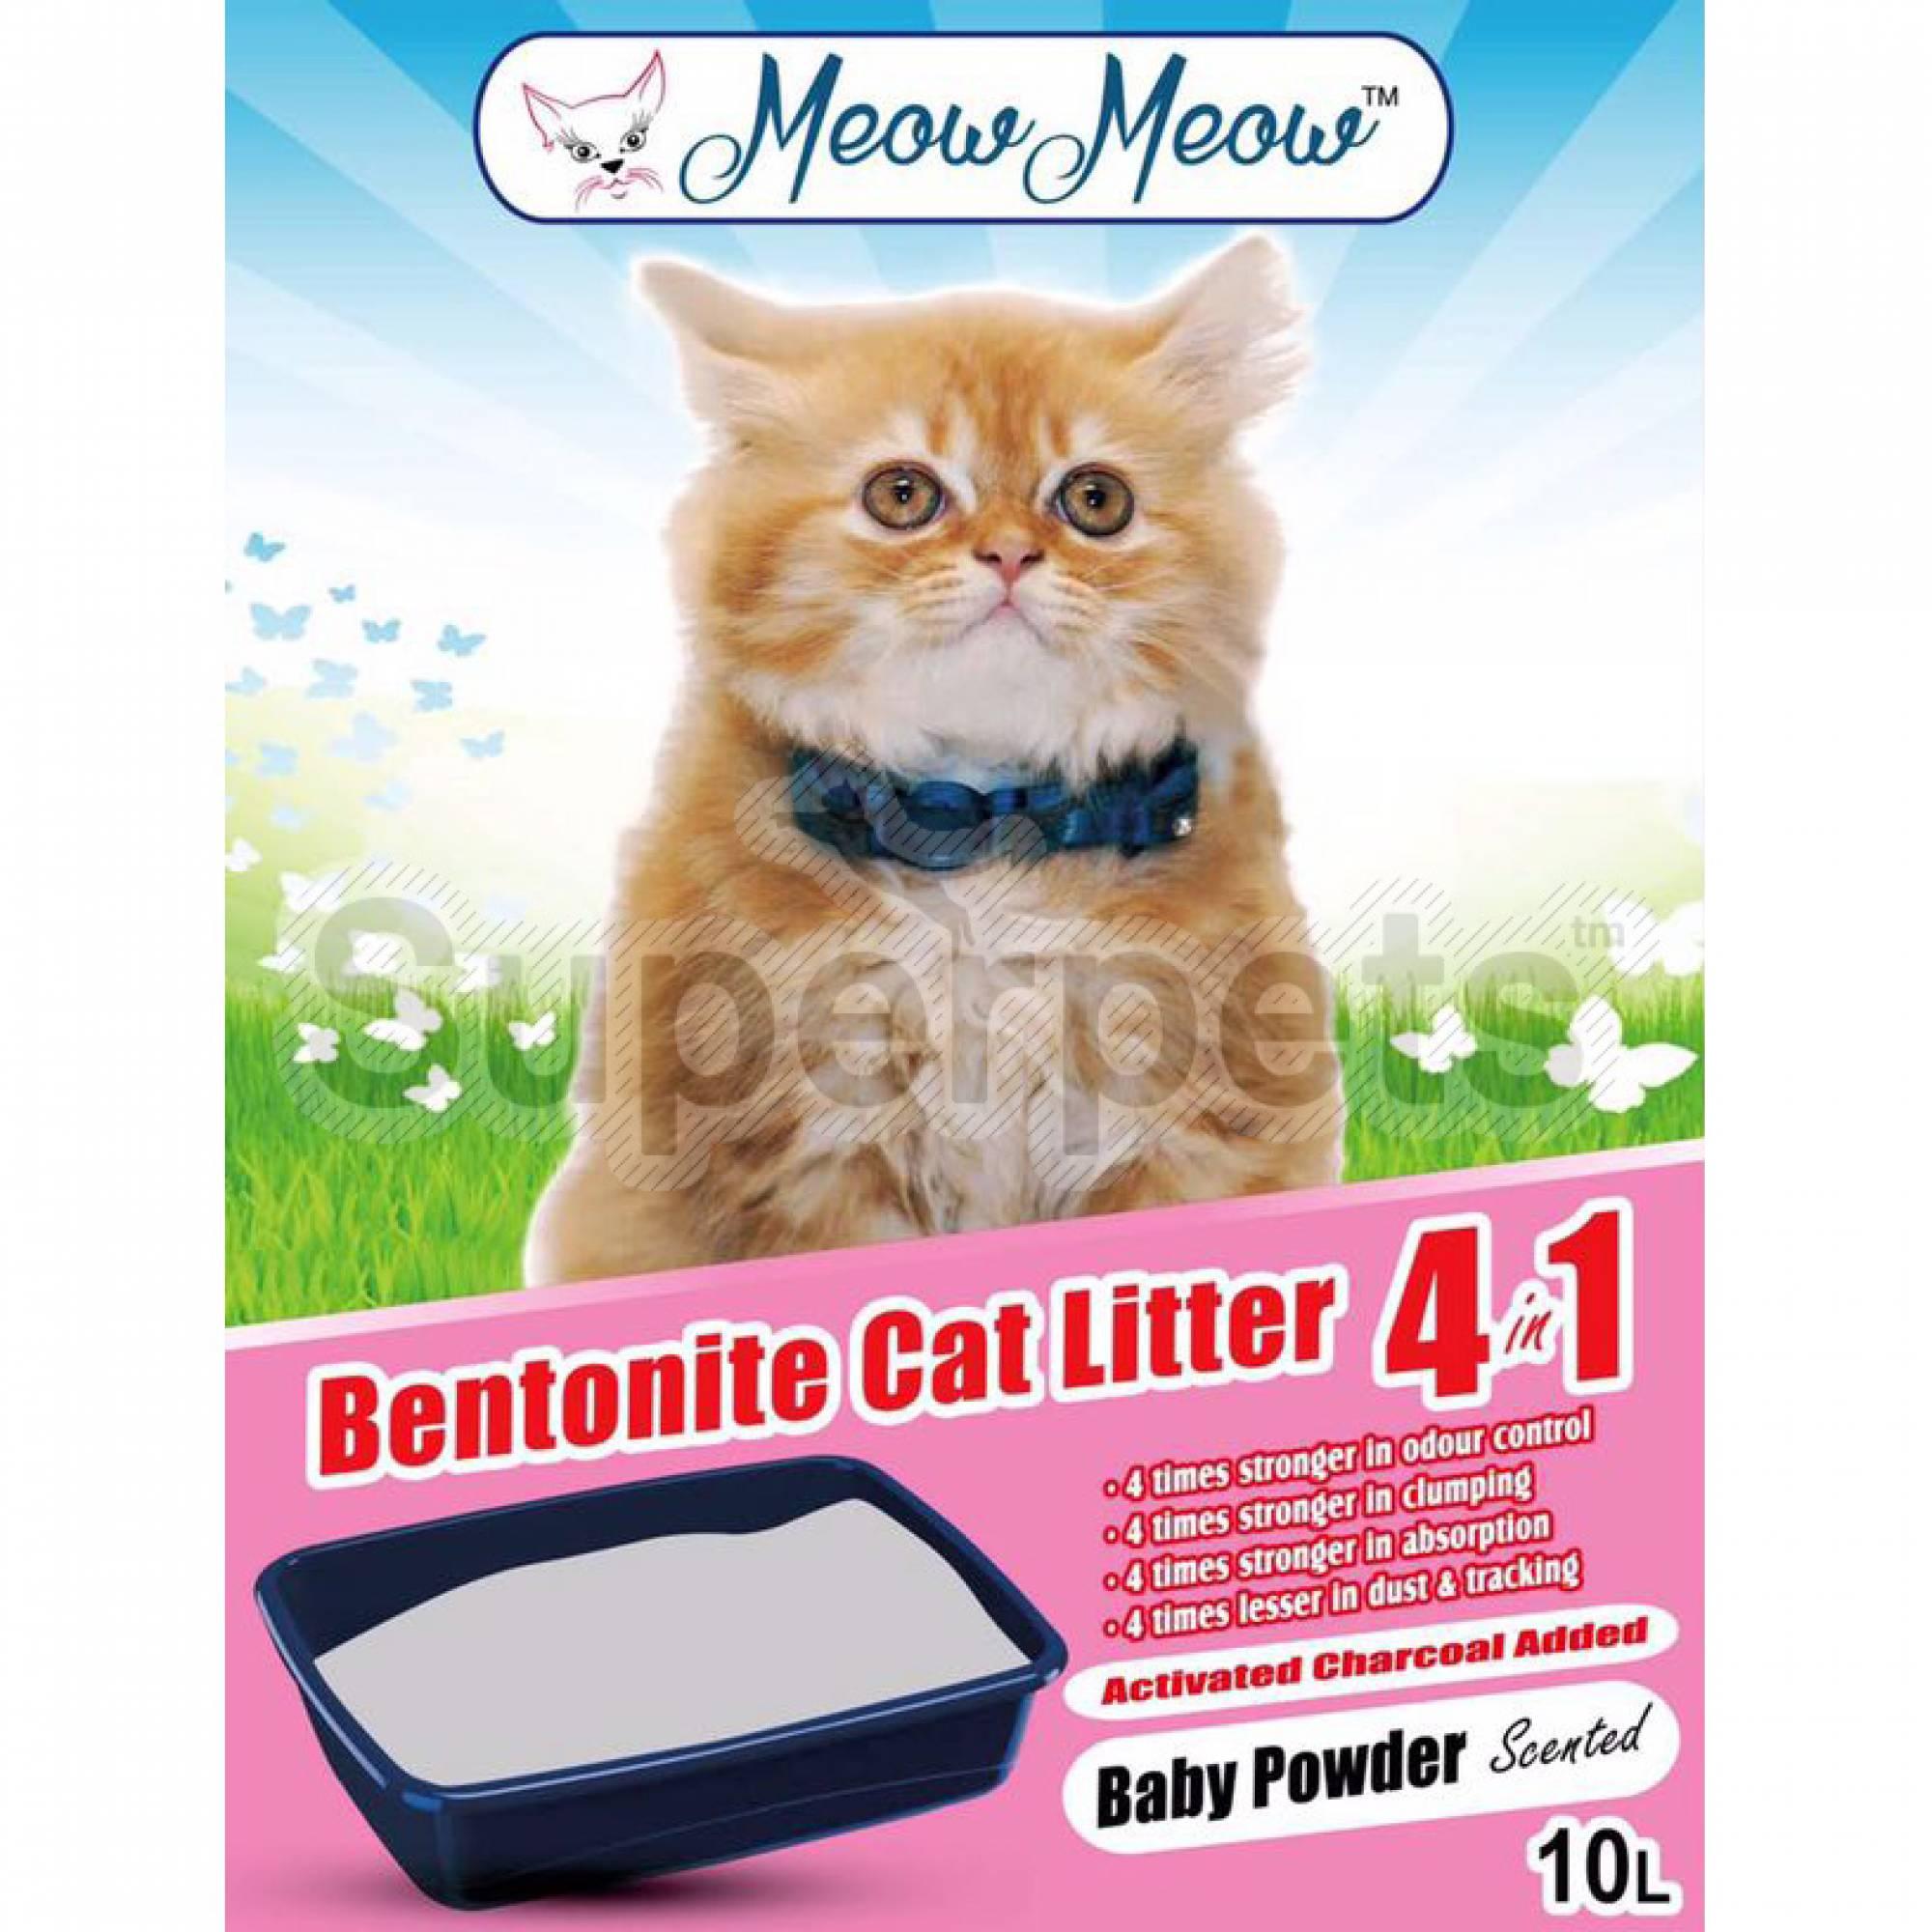 Meow Meow - Bentonite Cat litter 4-in-1 - Baby Powder 10L